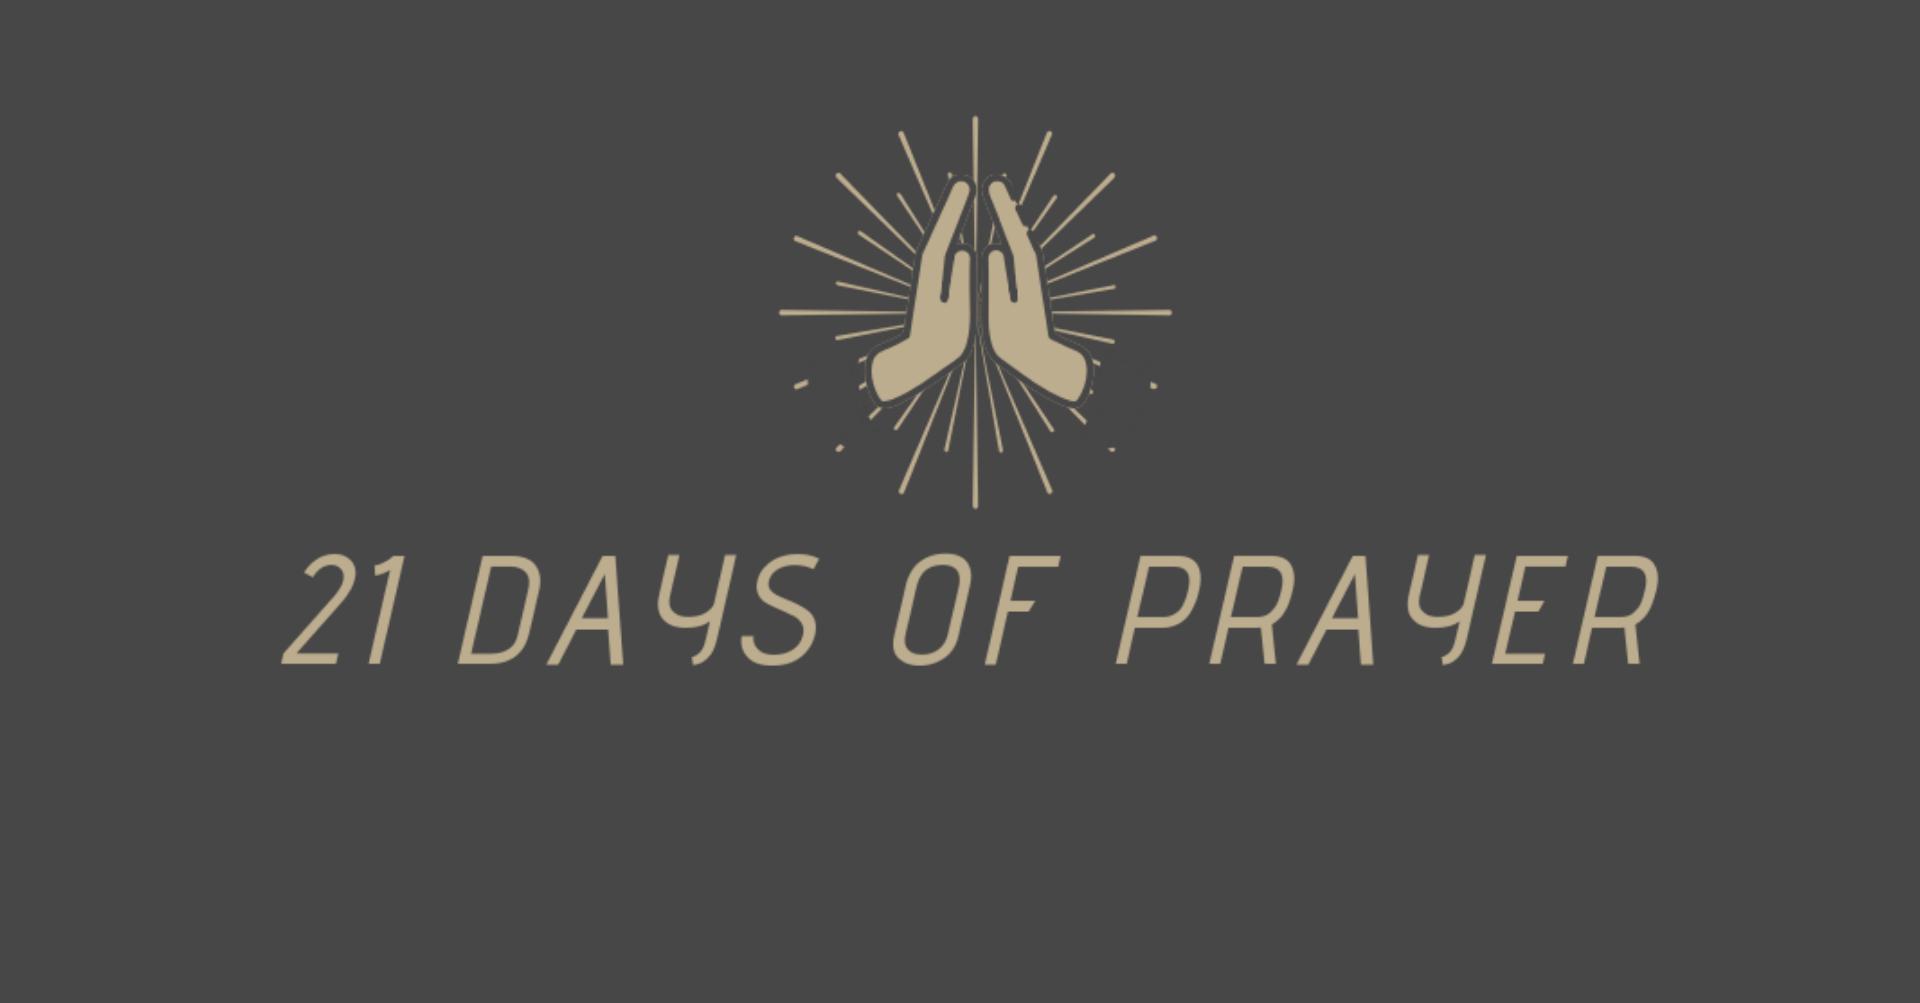 Prepare the way - 21 Days of Prayer